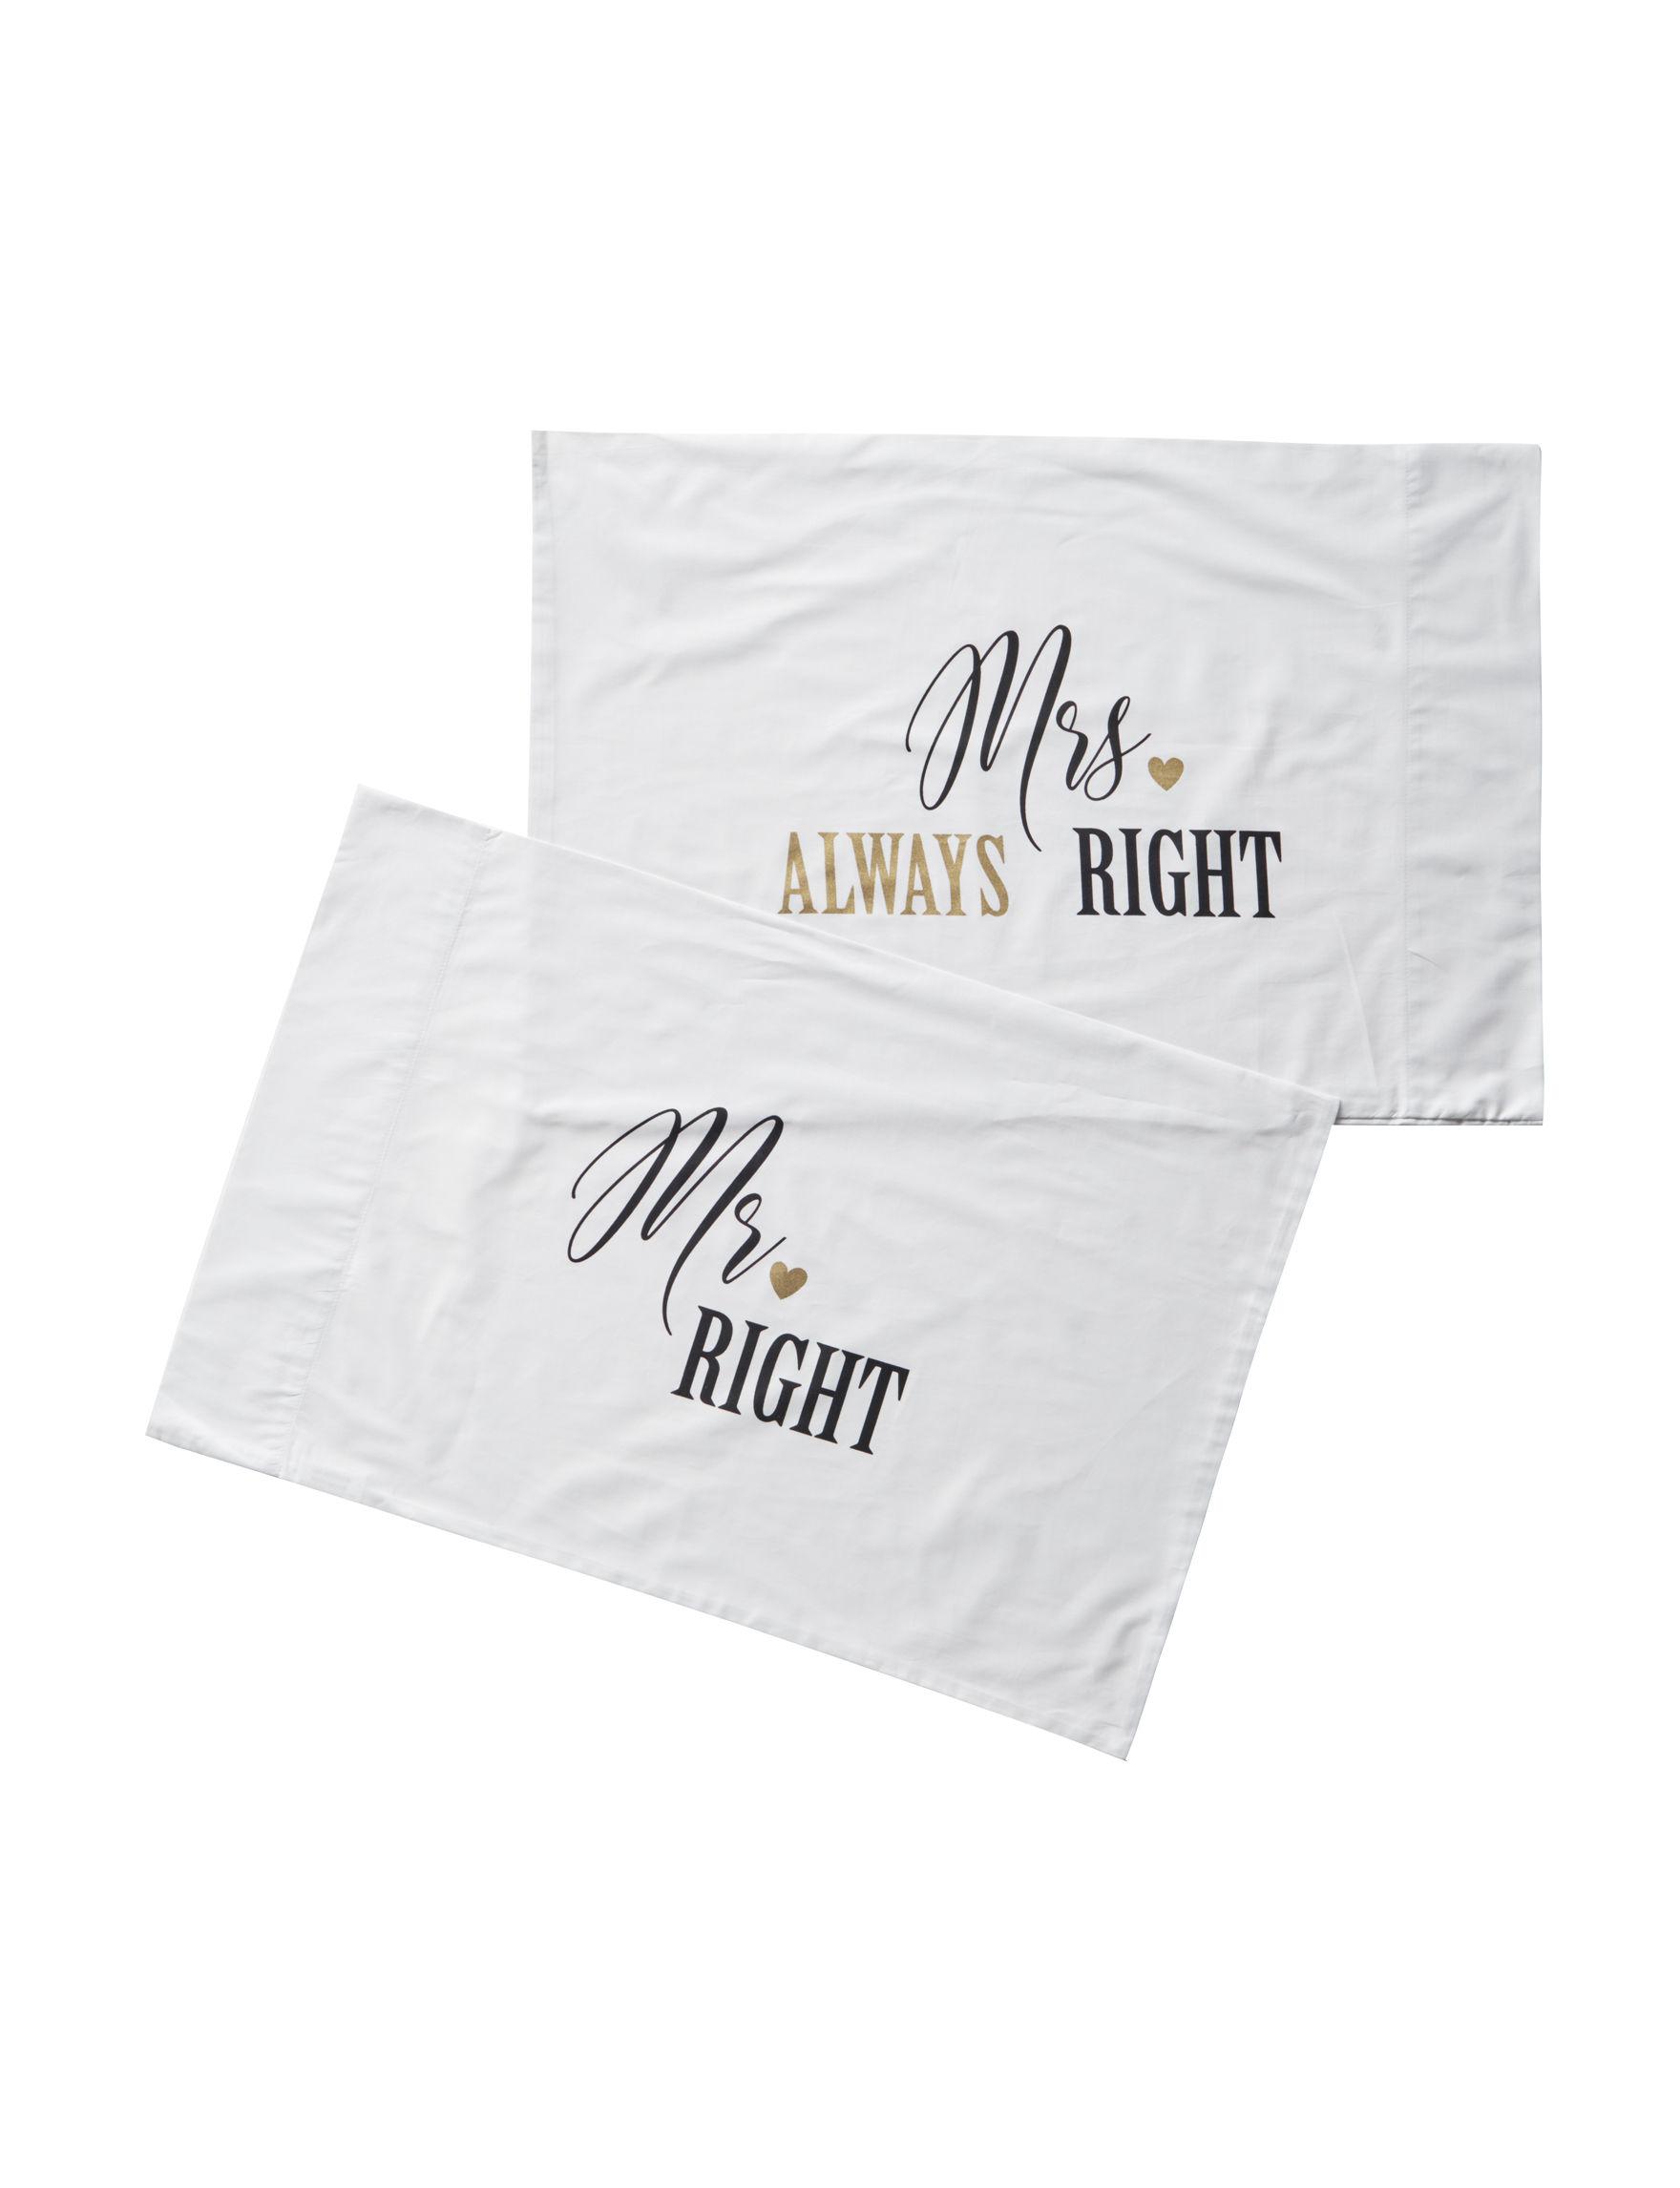 Pillow Xpressions White / Black Sheets